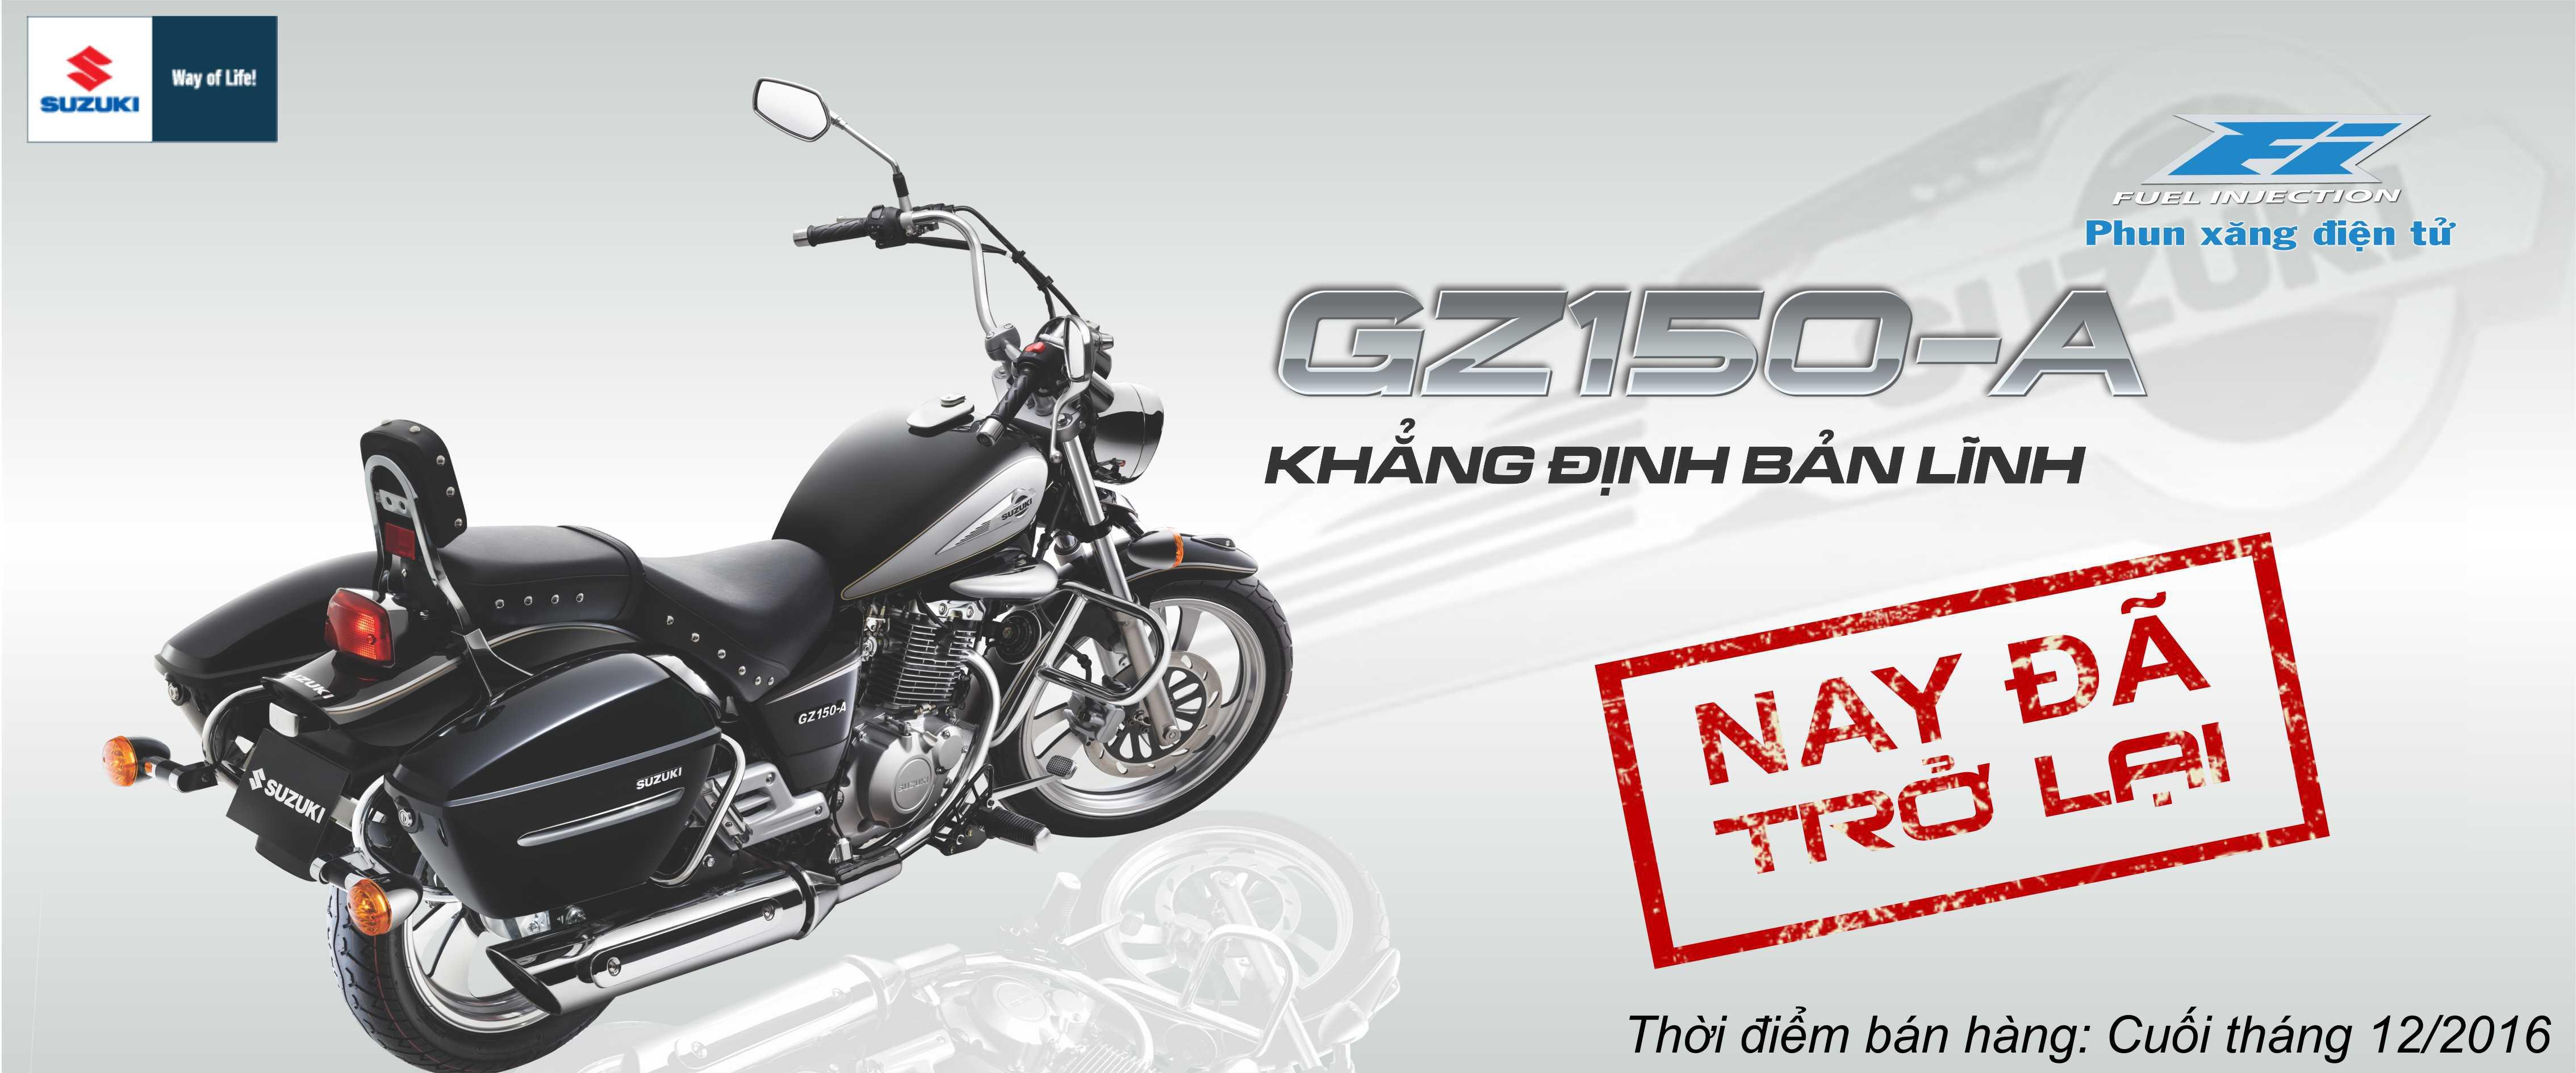 Suzuki Hayate  Fi Top Speed